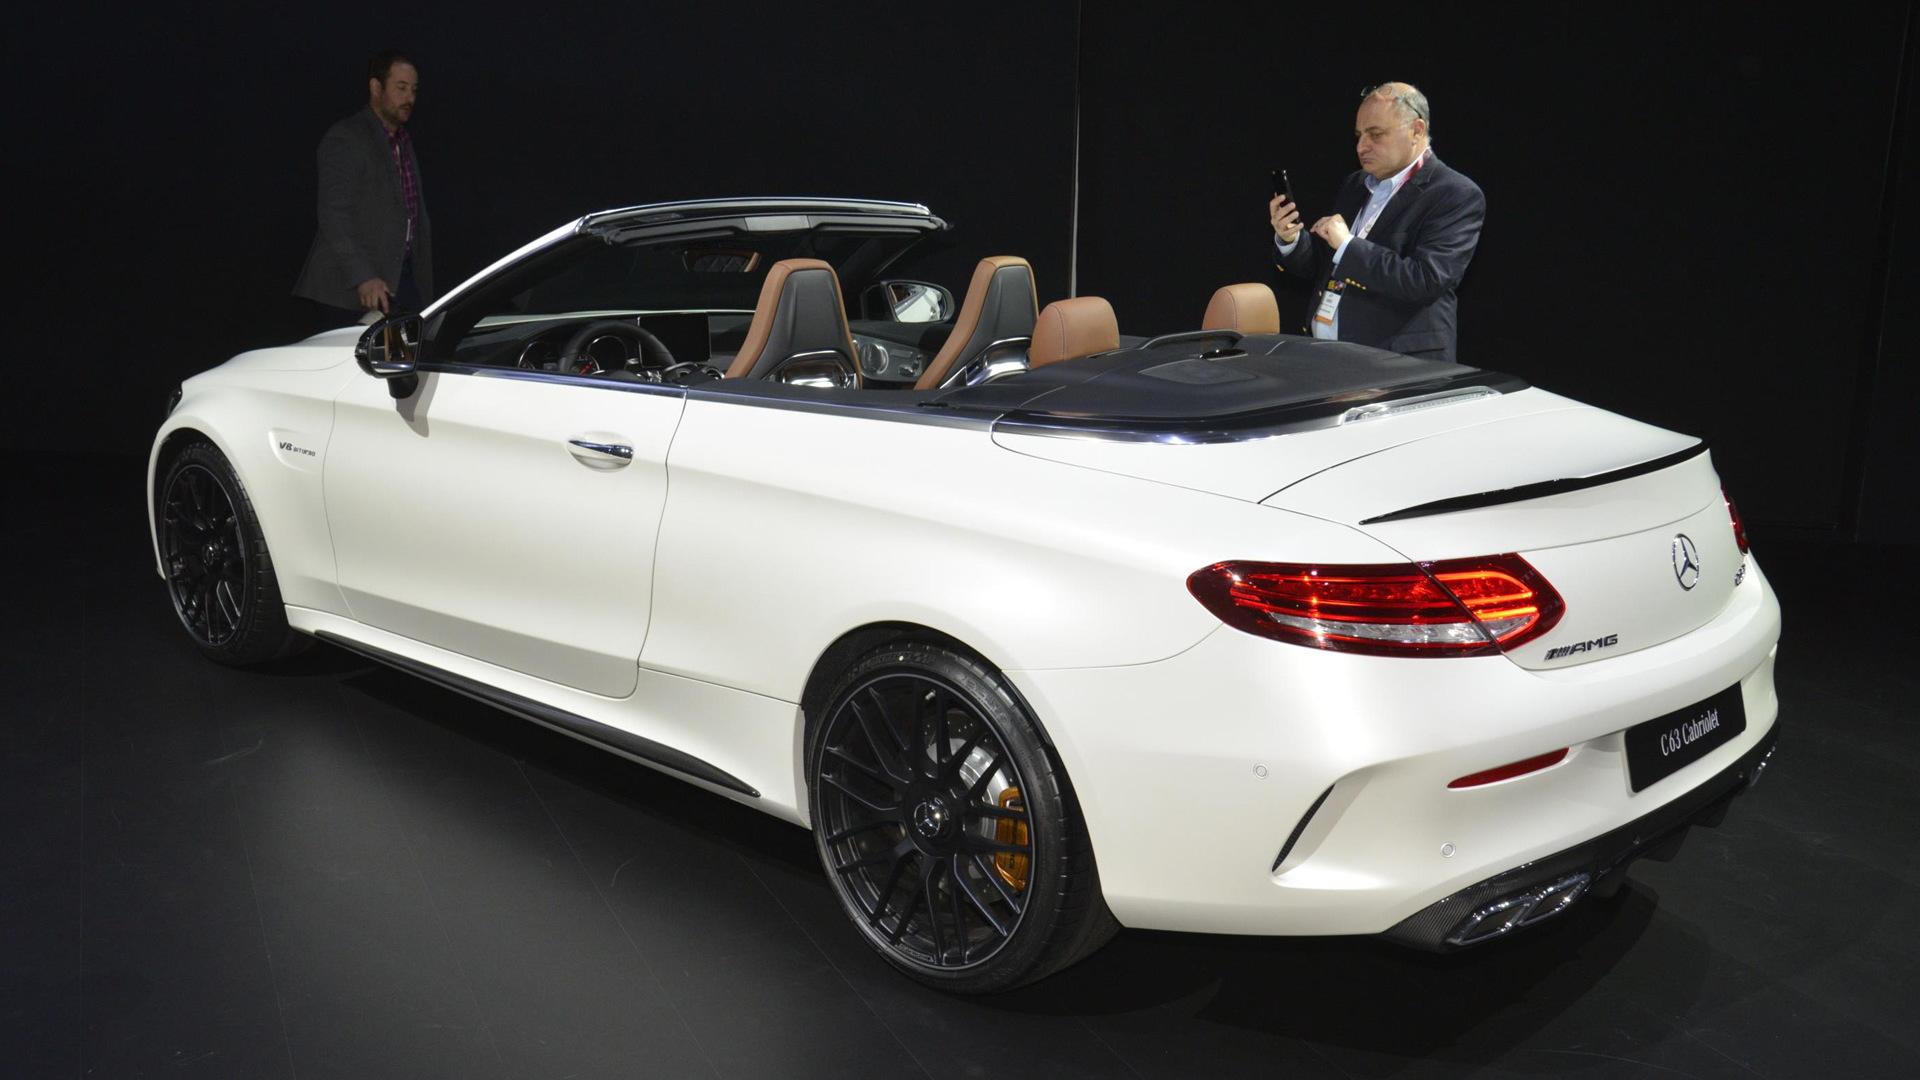 2017 Mercedes-AMG C63 AMG Cabriolet, 2016 New York Auto Show